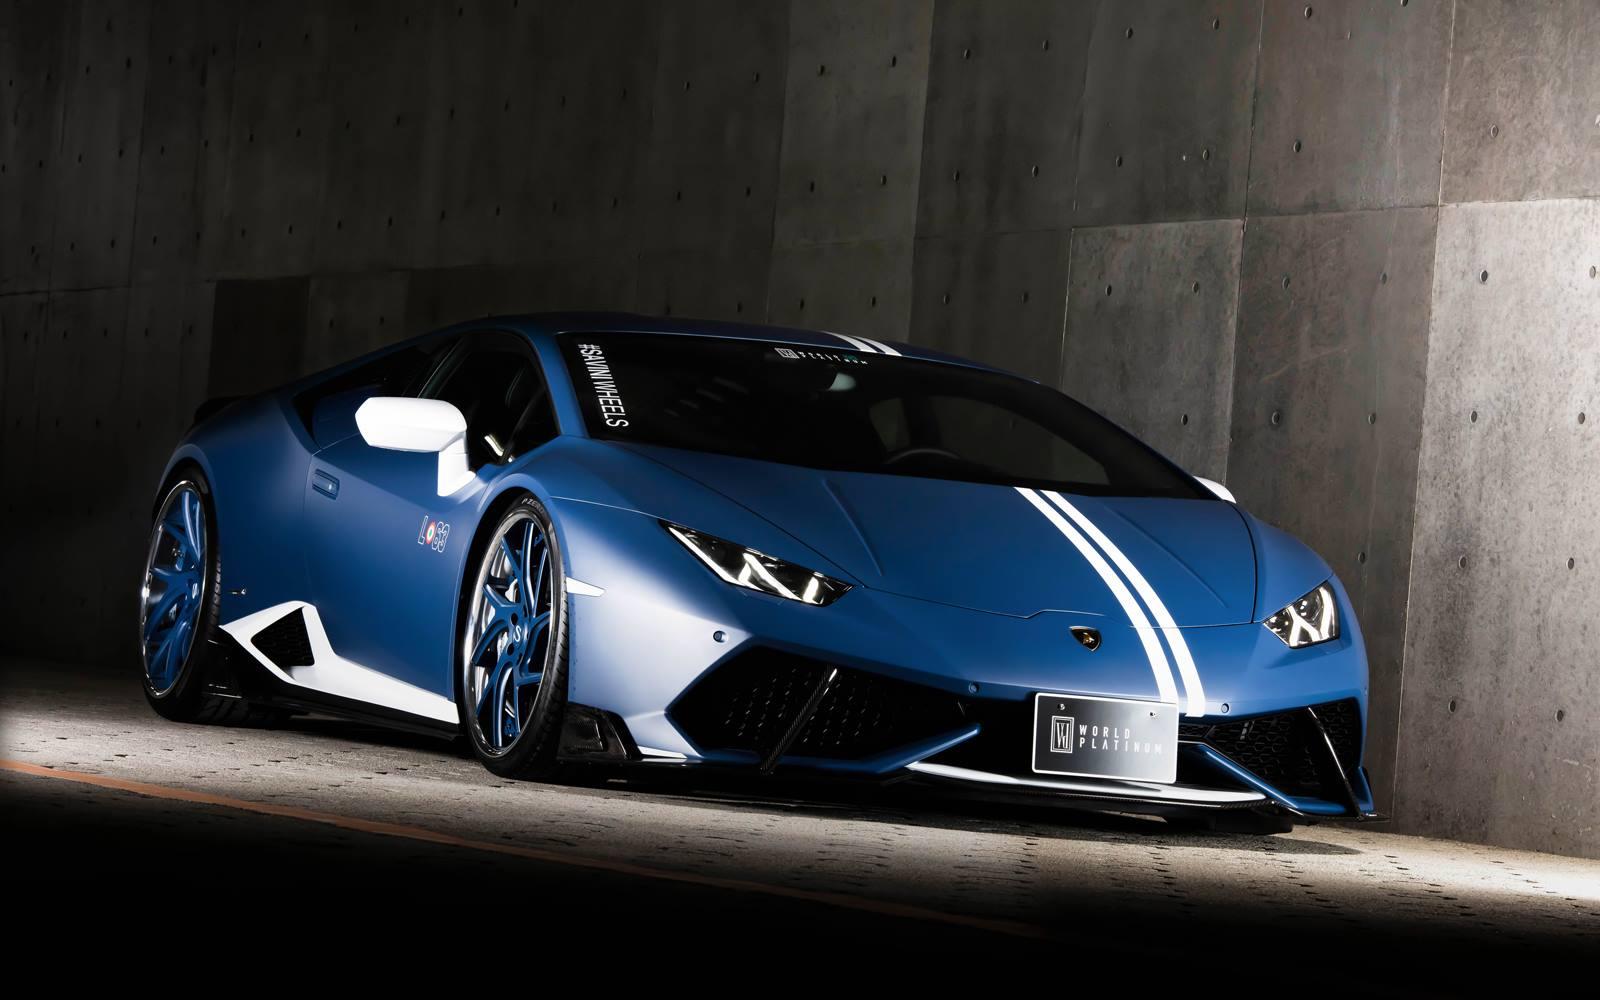 El ltimo Lamborghini Huracn de Rowen luce discreto pero